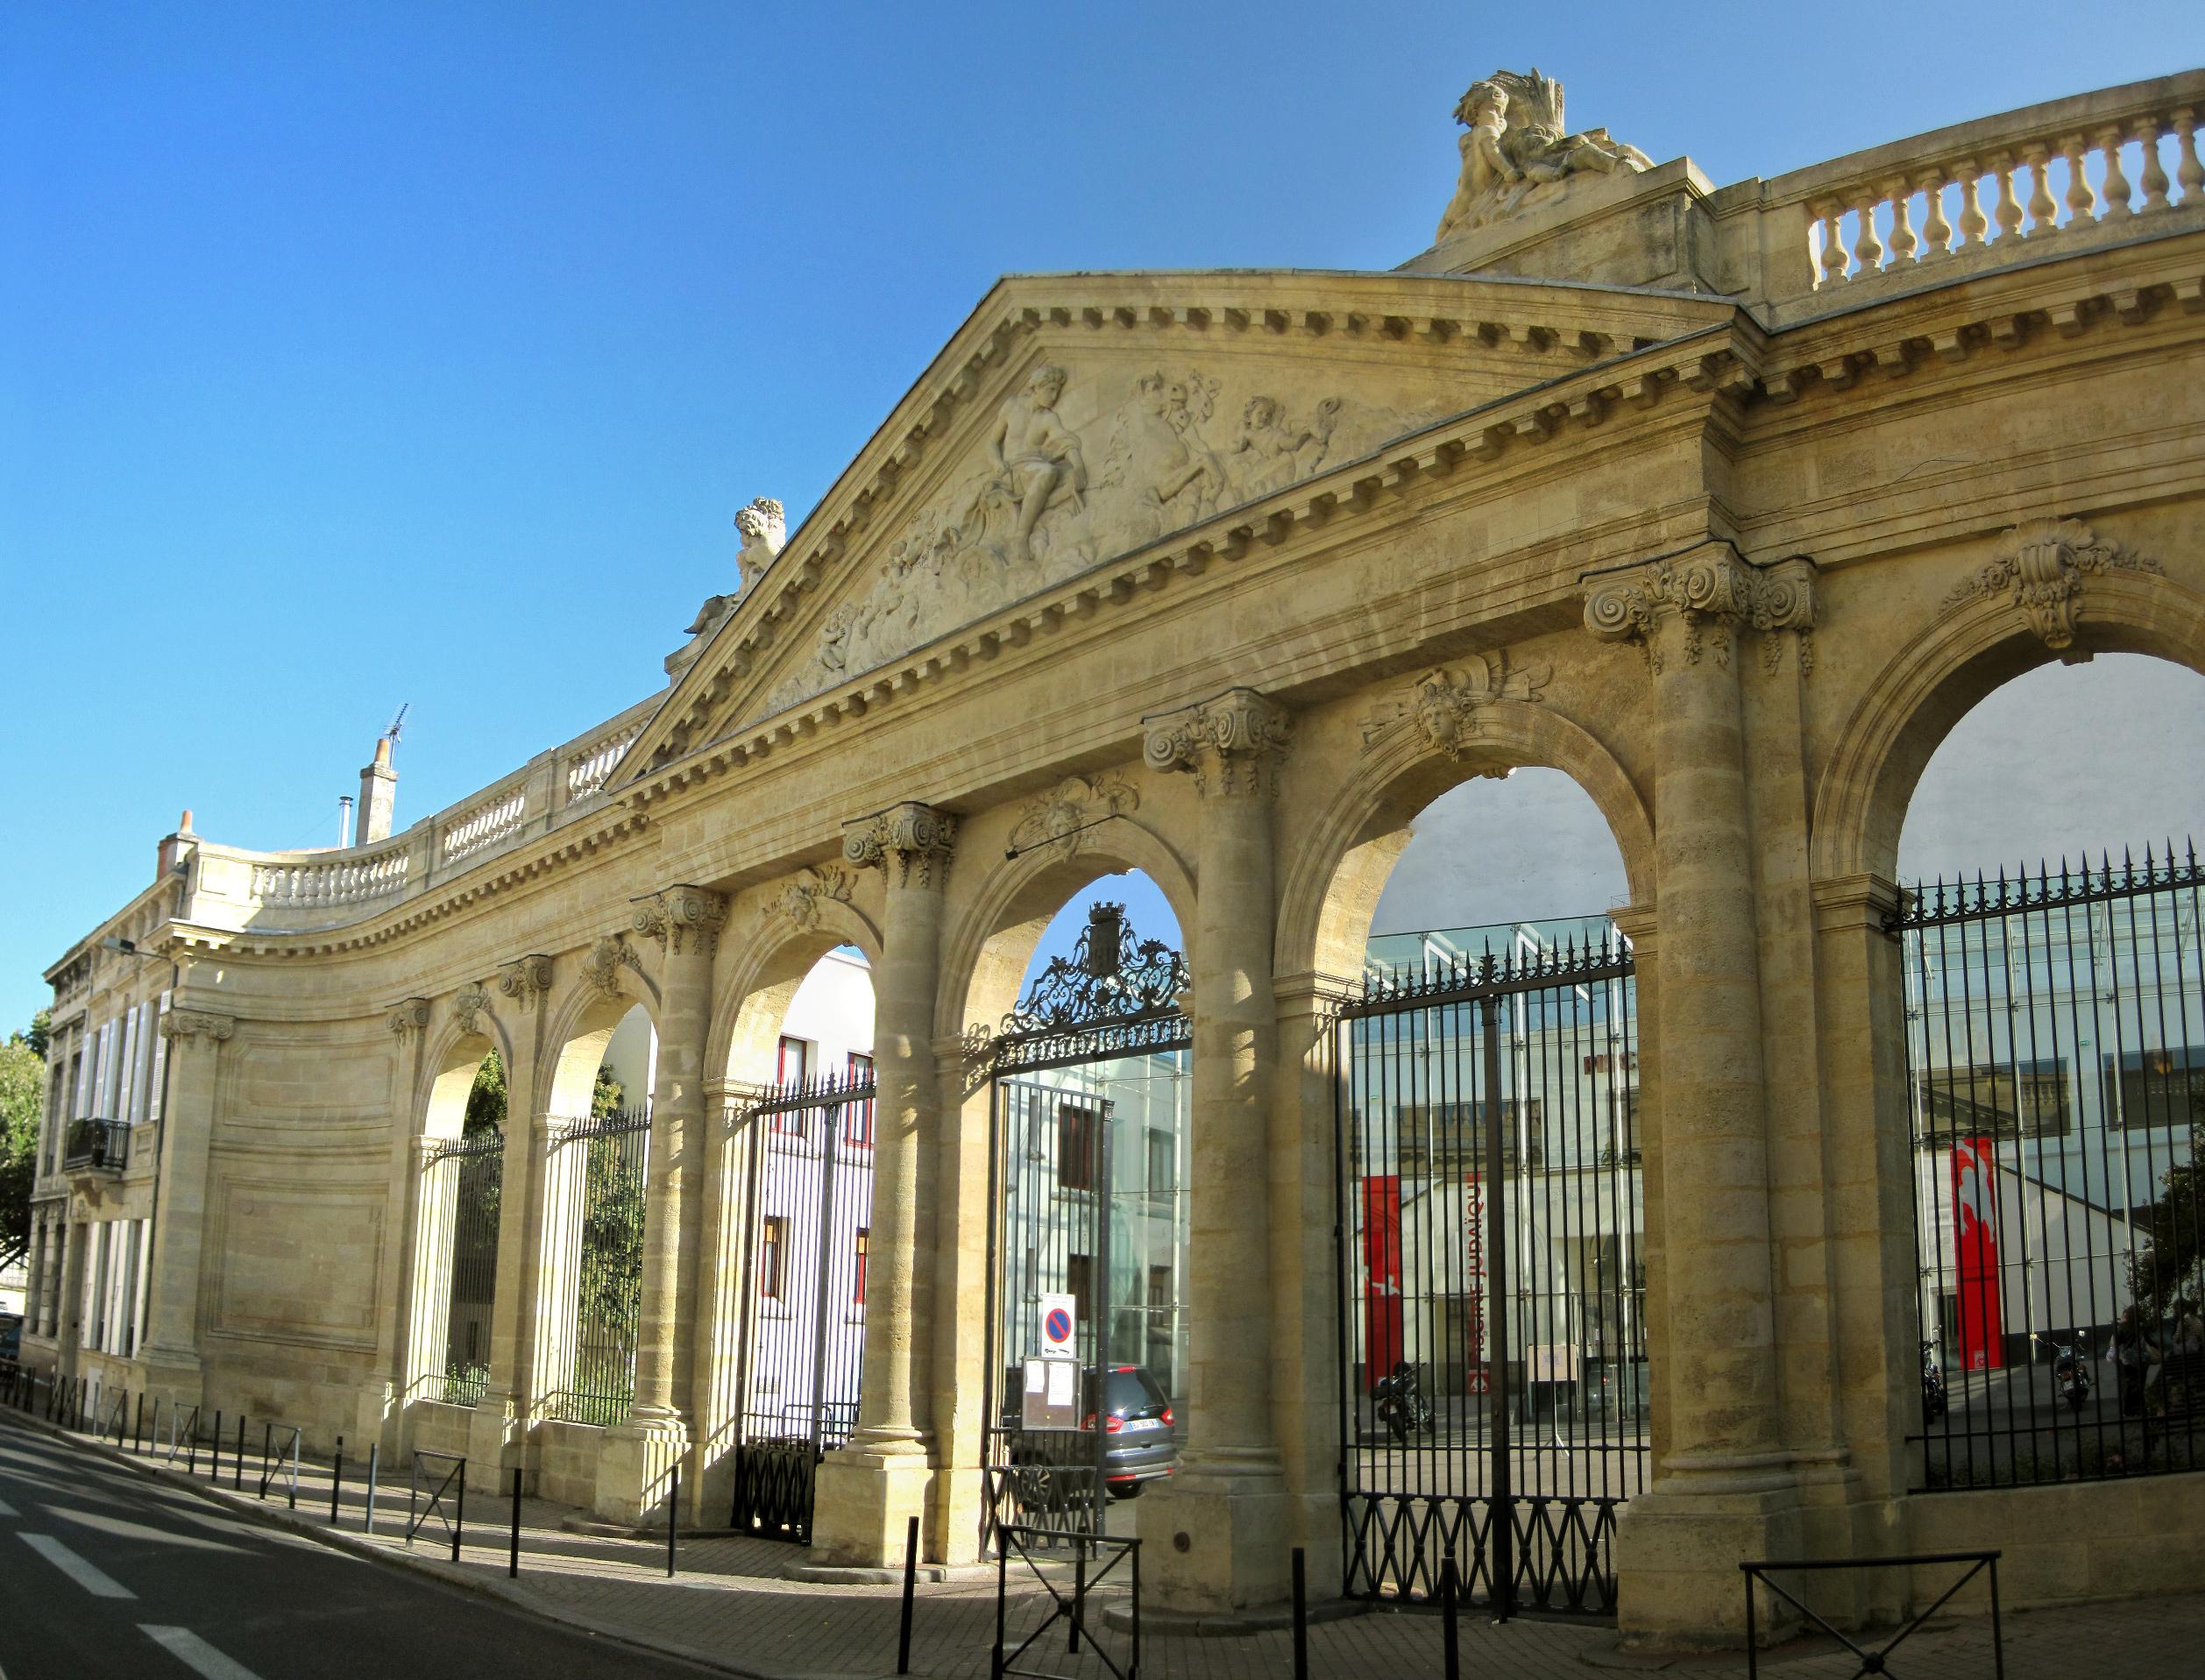 Piscine Judaïque — Wikipédia dedans Piscine Judaique Bordeaux